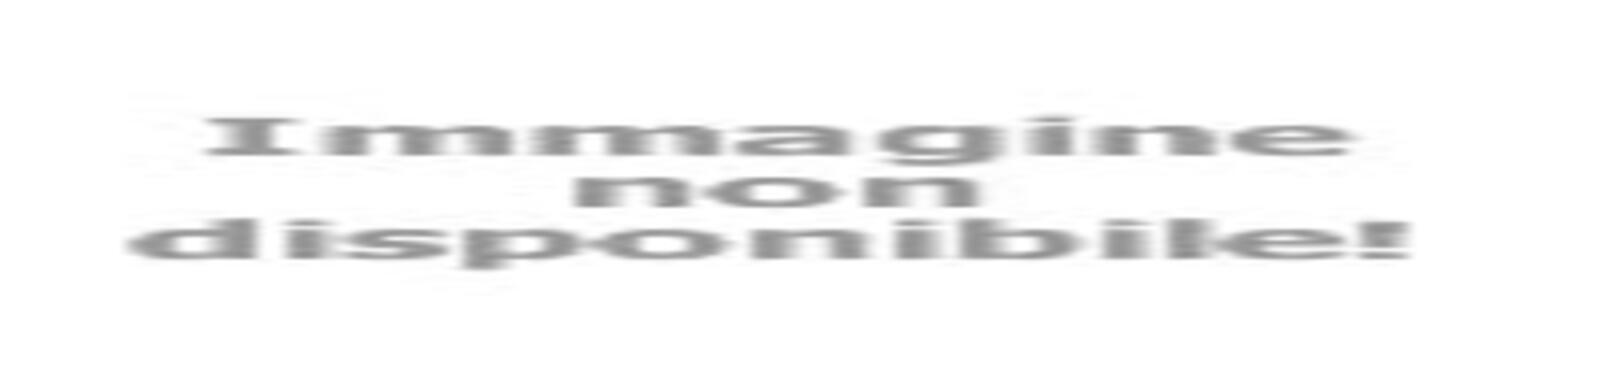 petronianaviaggi it armenia-v251 002